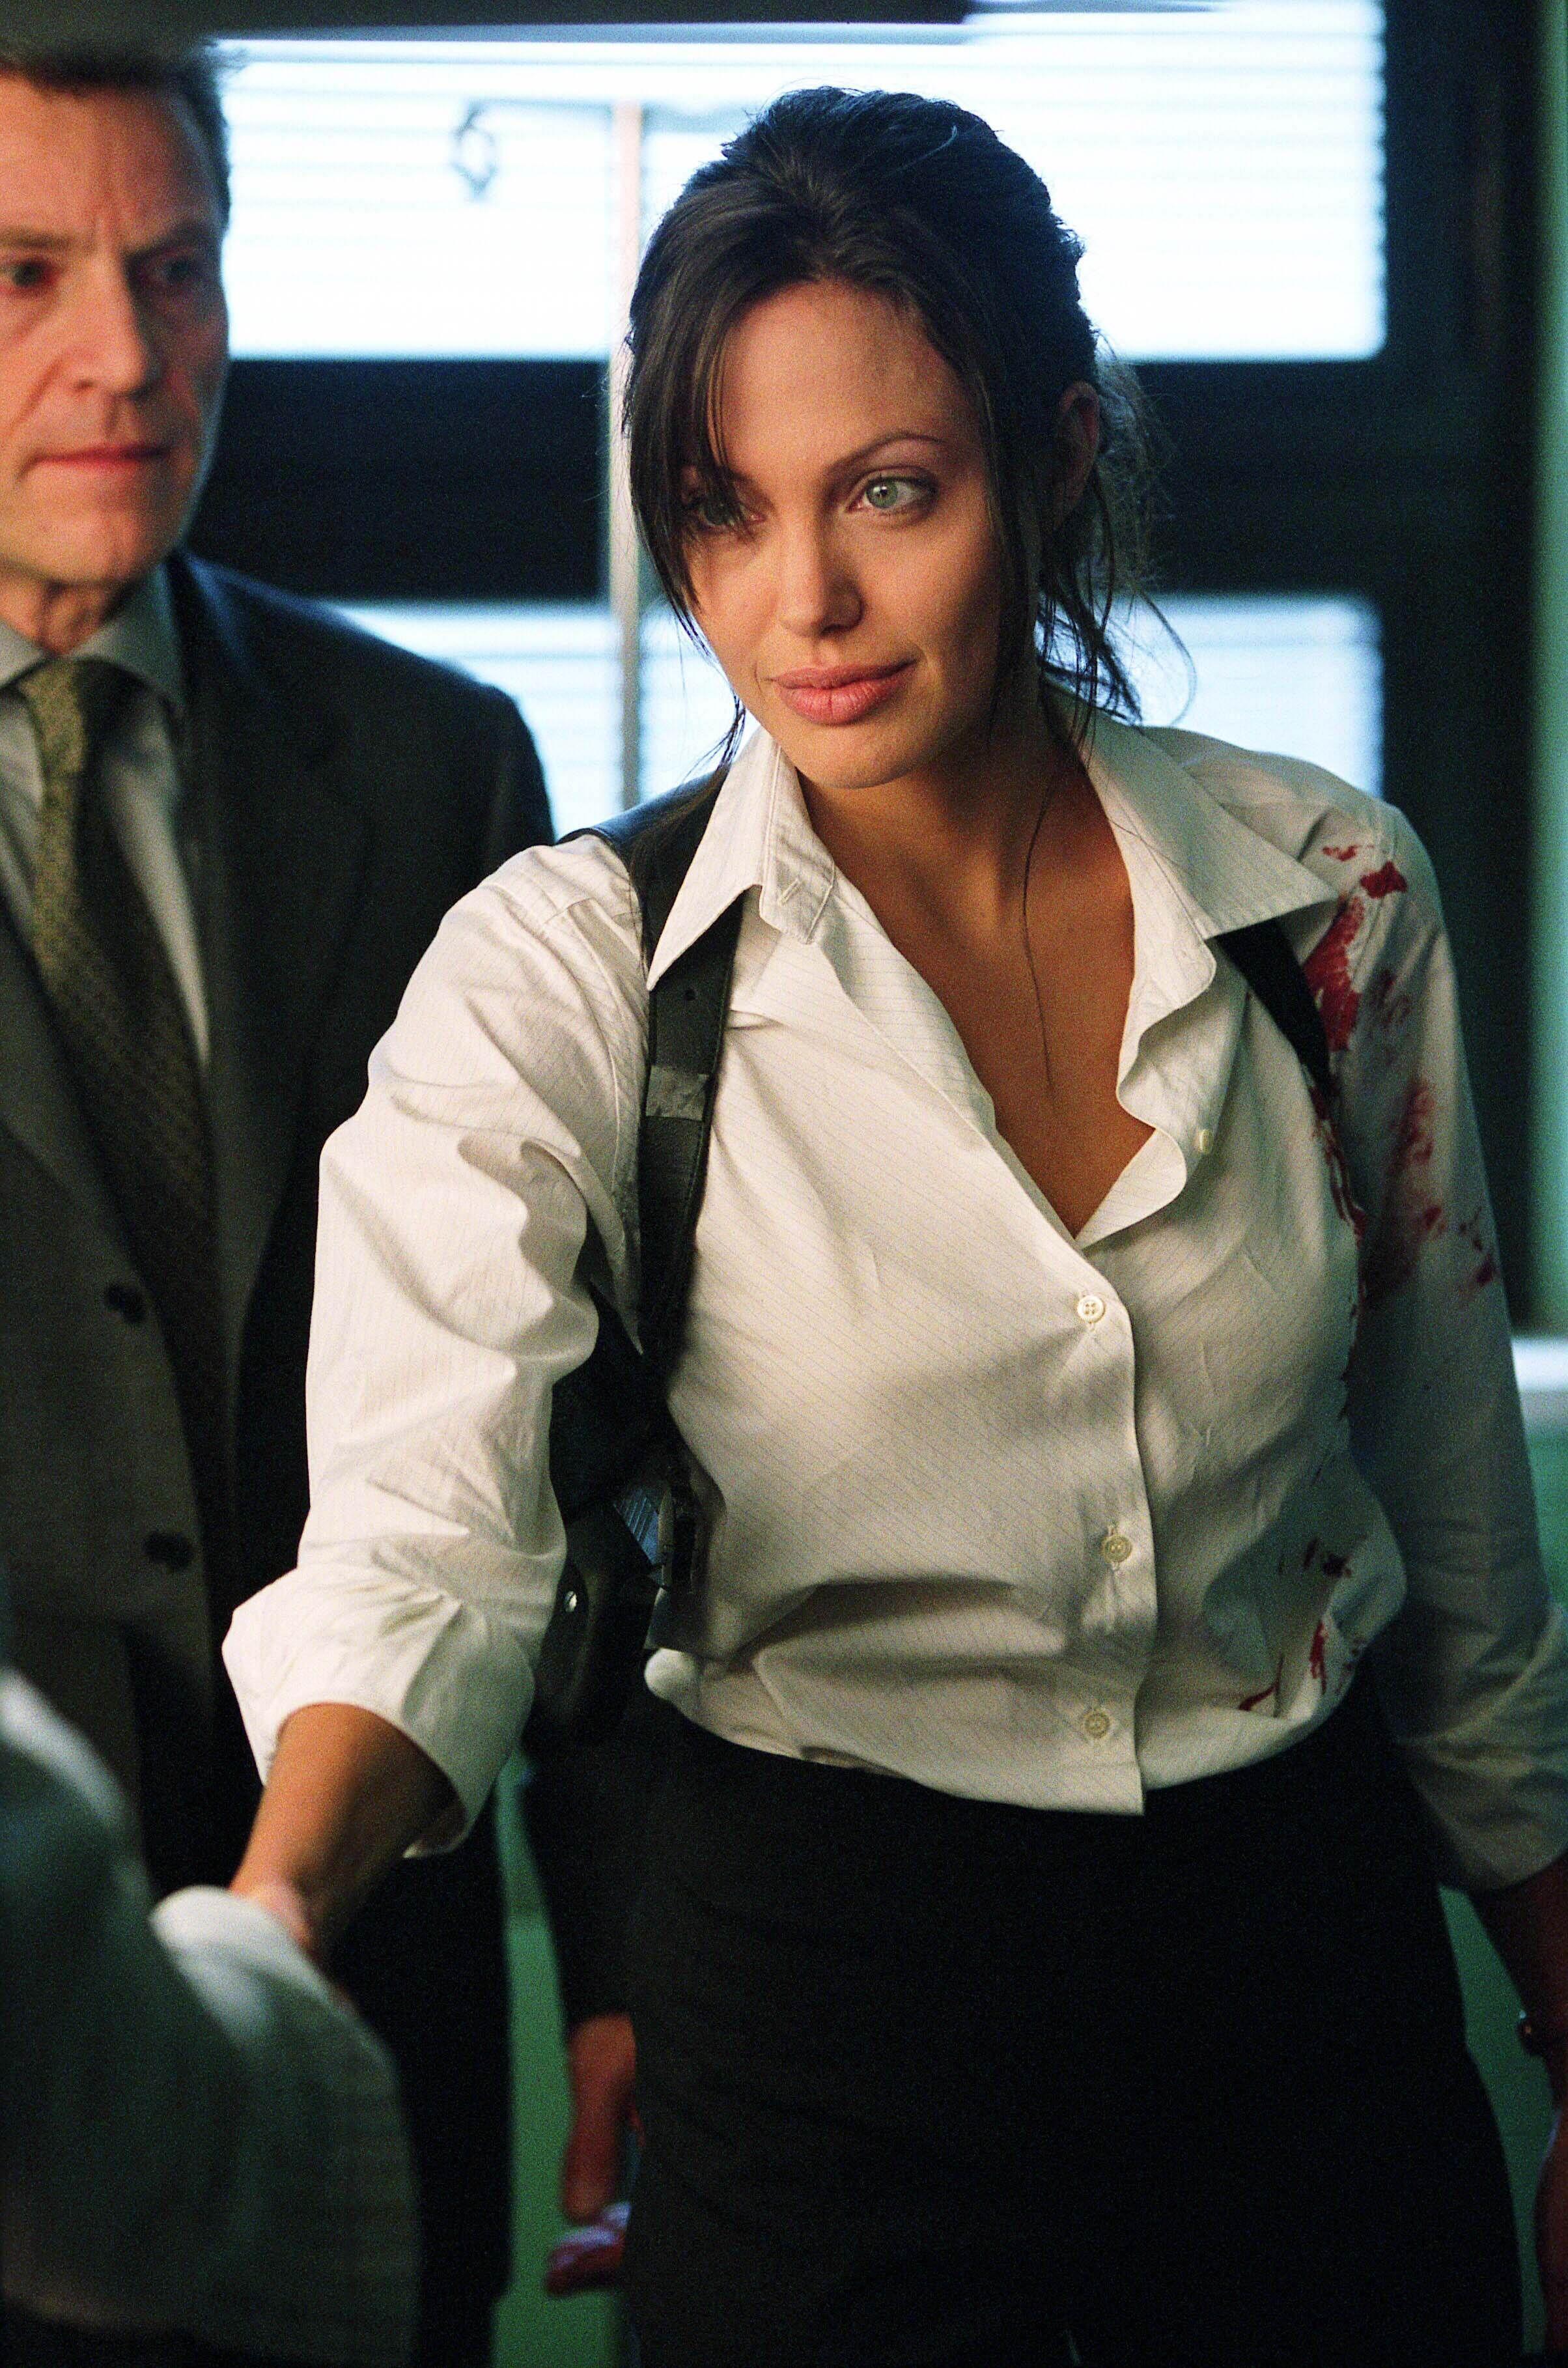 Angelina Jolie Naked Taking Lives taking lives [2004] | angelina jolie movies, angelina jolie